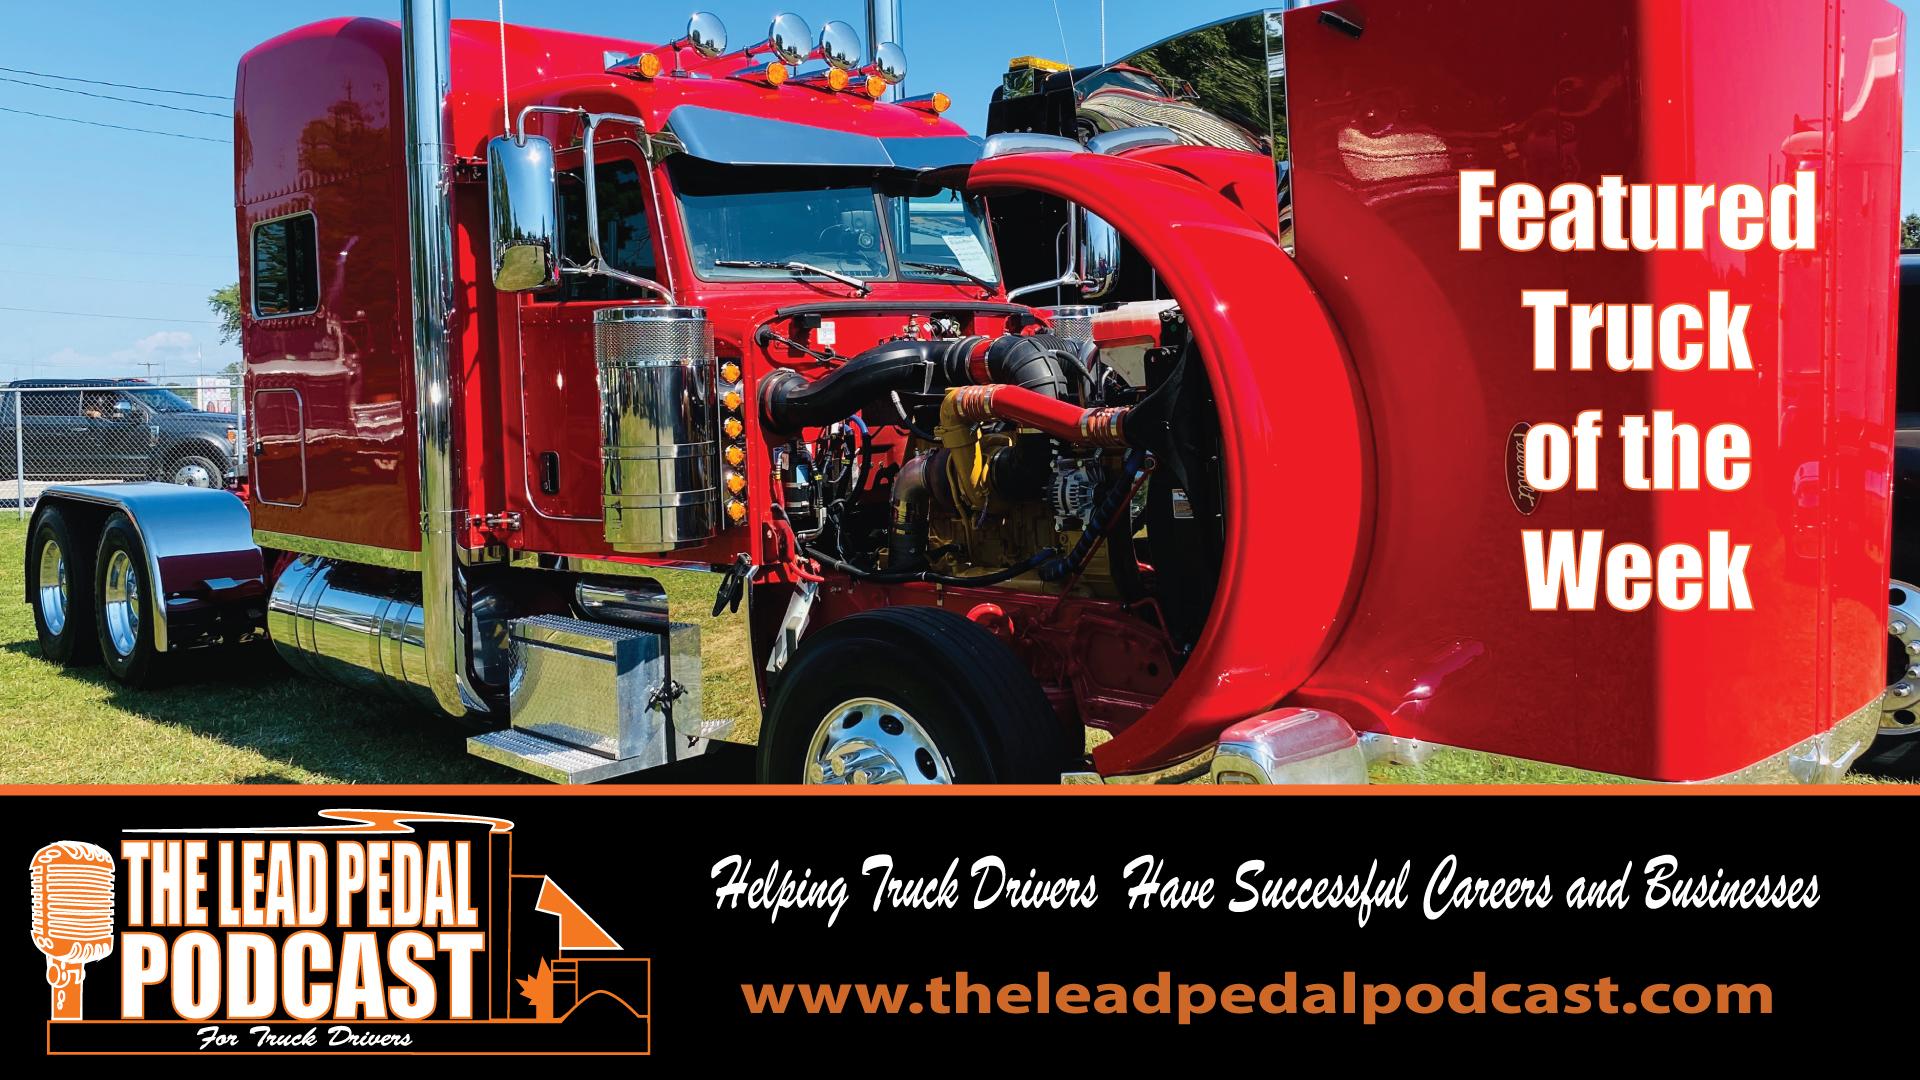 LP603 Featured Truck of the Week 2020 Red Peterbilt